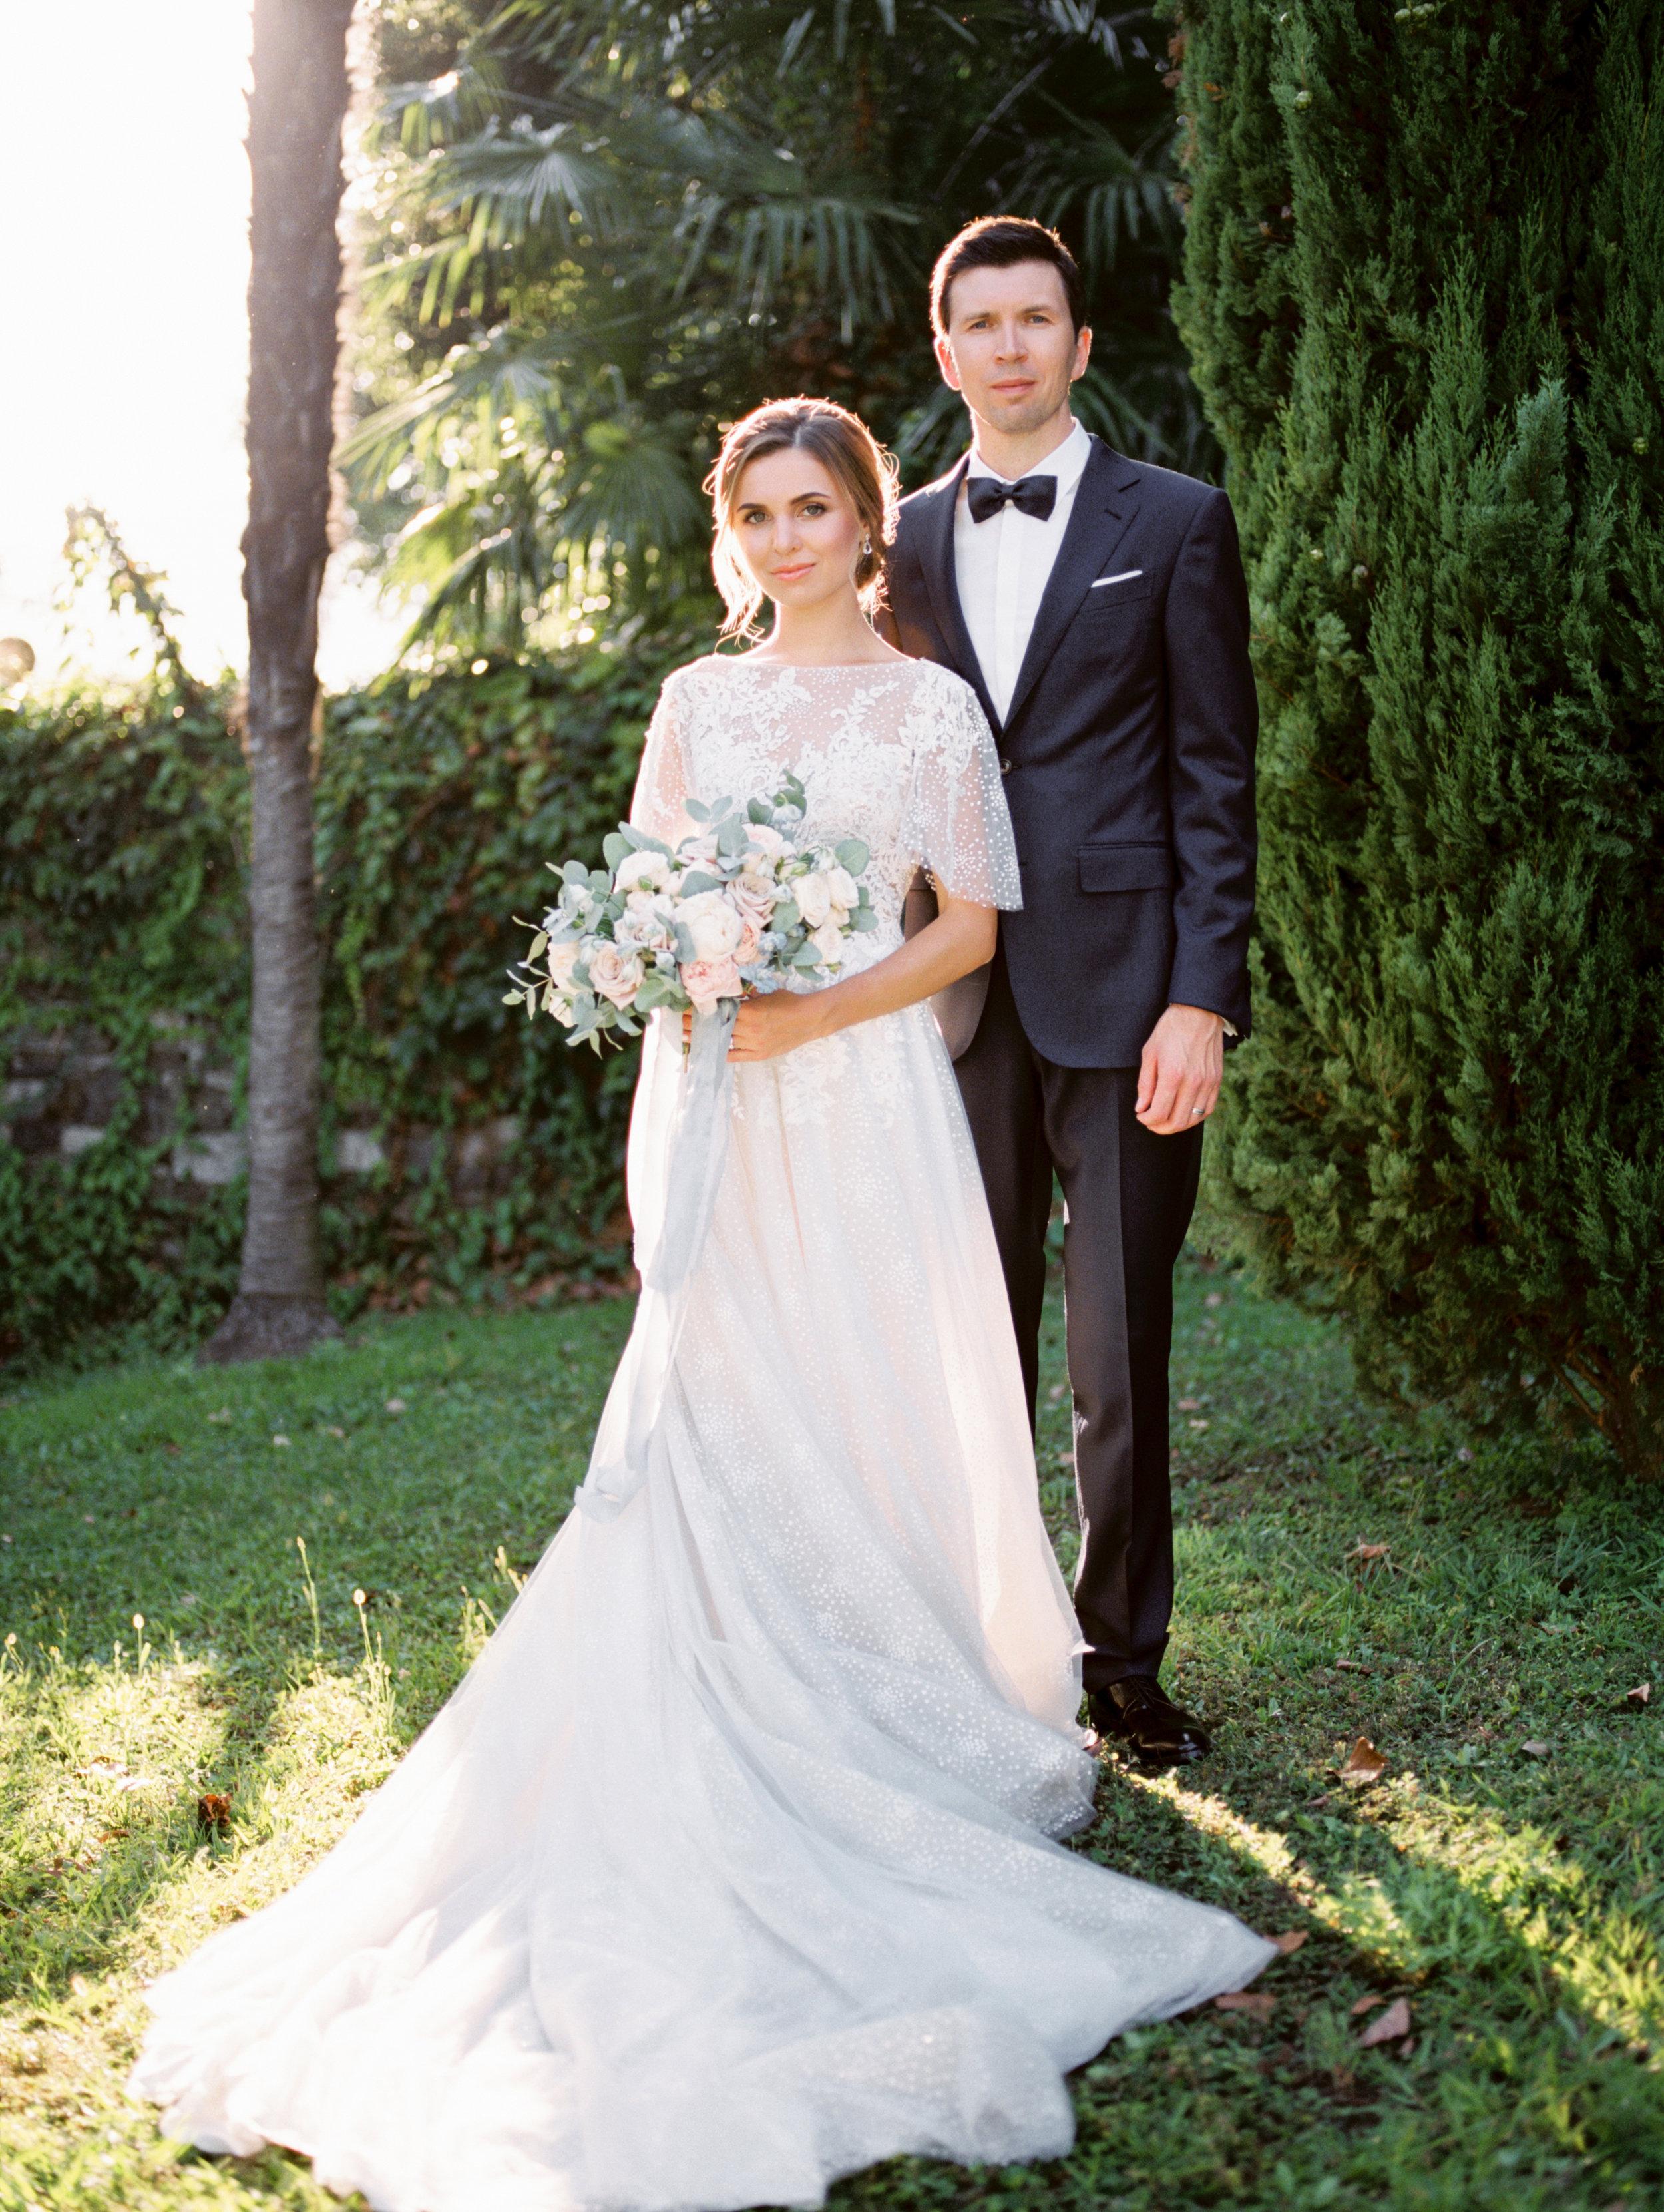 030-film-by-Marina-Fadeeva-wedding-photographer.jpg